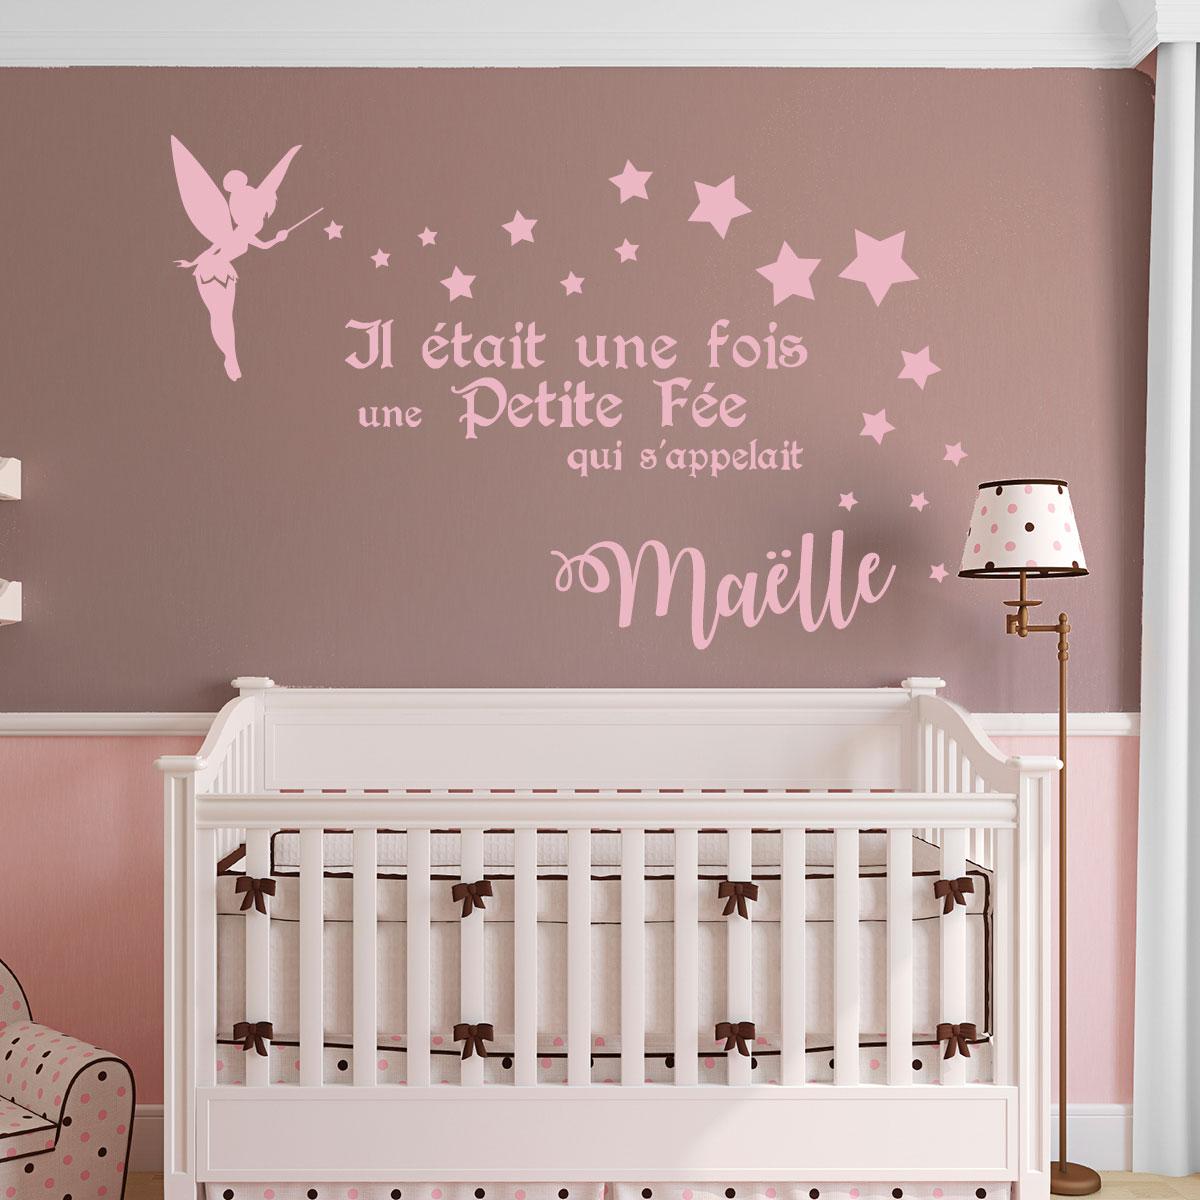 sticker mural personnalis belgique wall murals. Black Bedroom Furniture Sets. Home Design Ideas